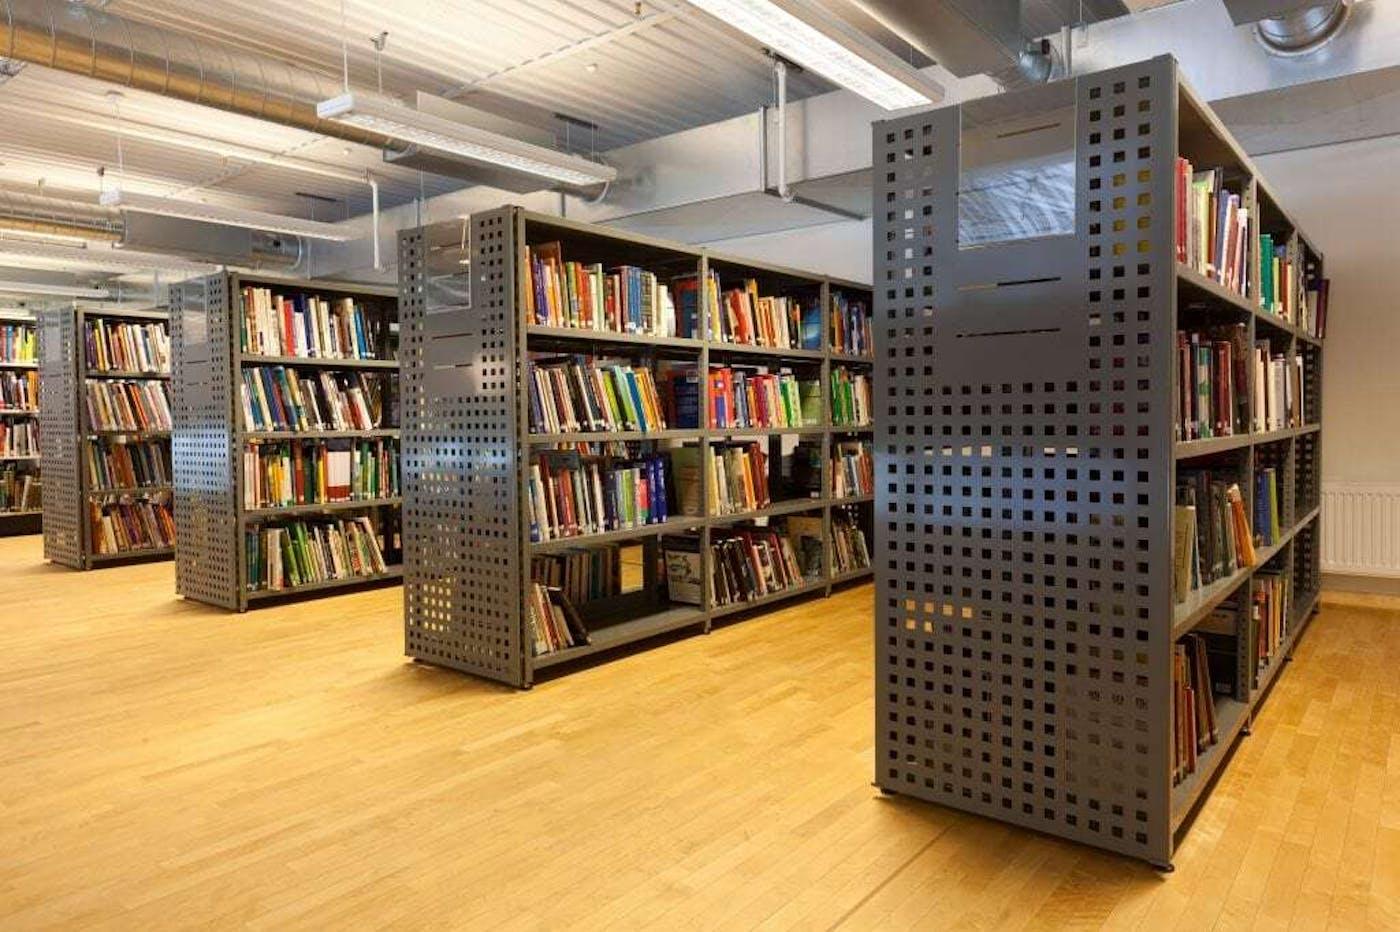 Geilo Bibliotek 1 1024x682